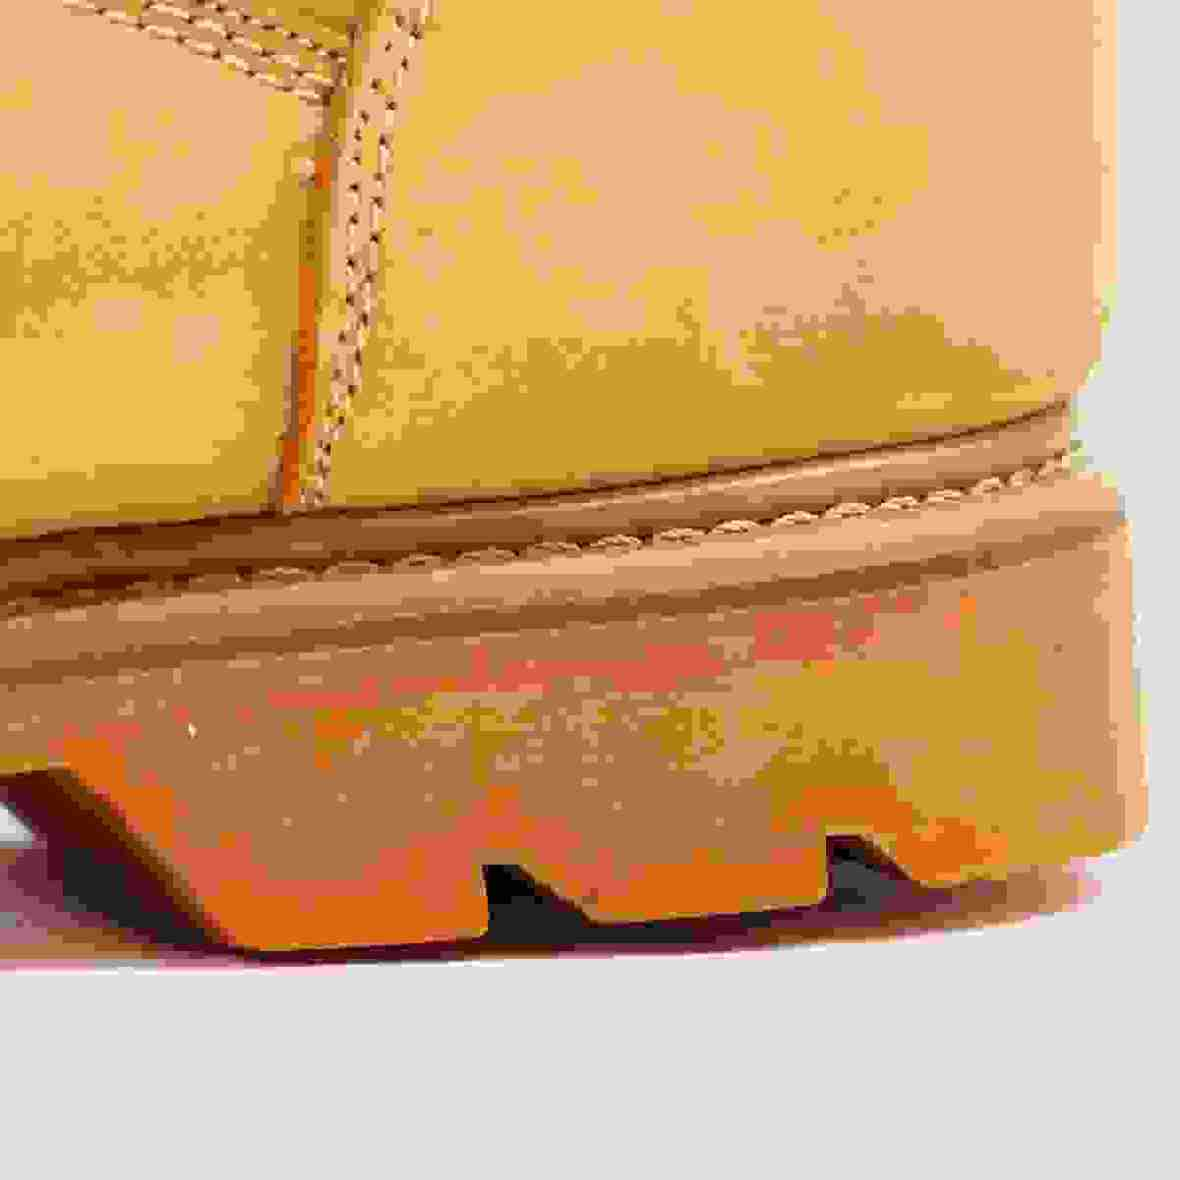 Tracking boots heel